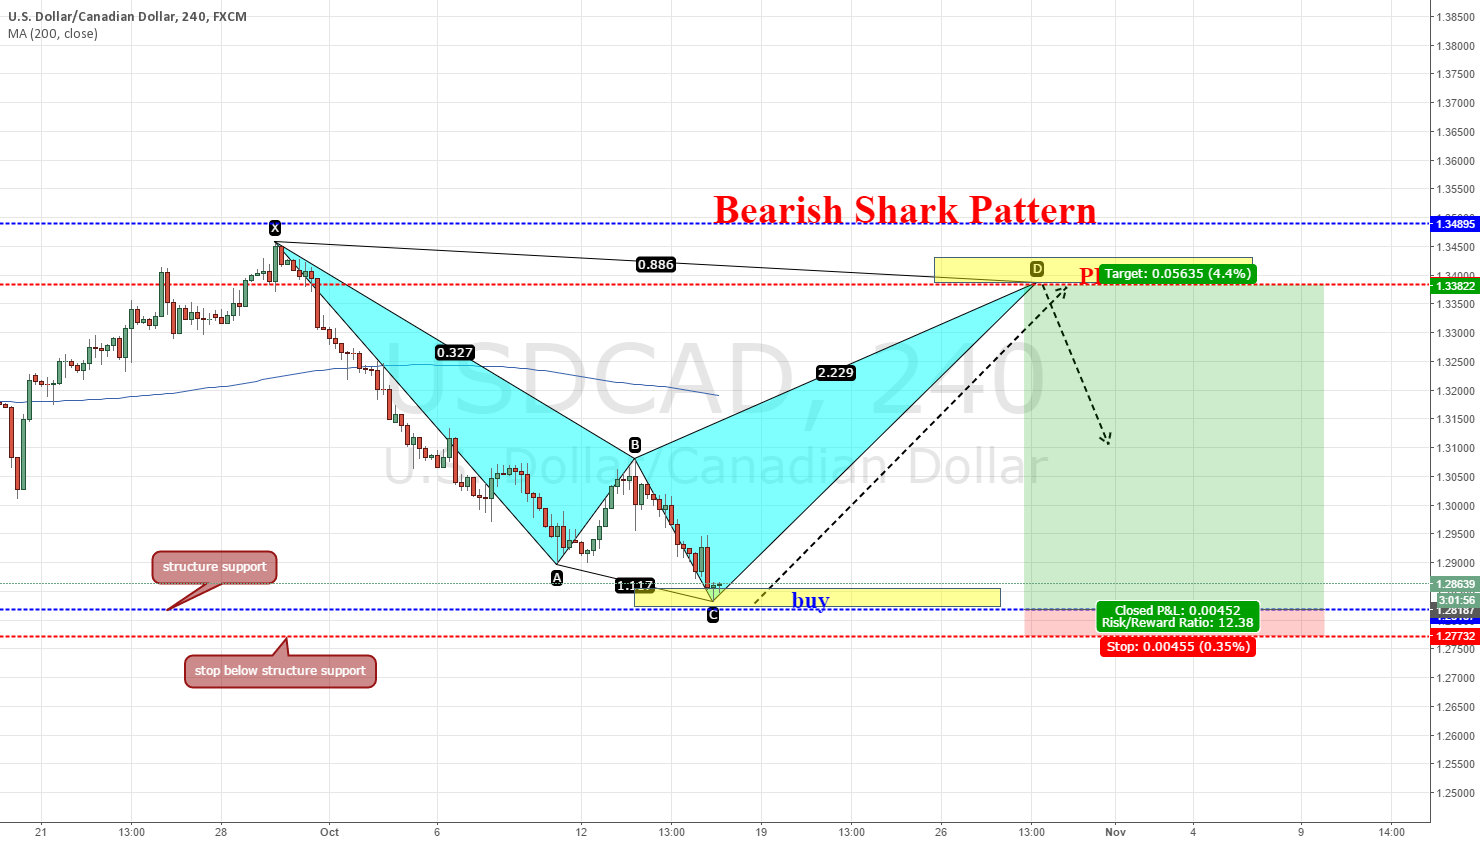 usdcad,240, bearish shark pattern